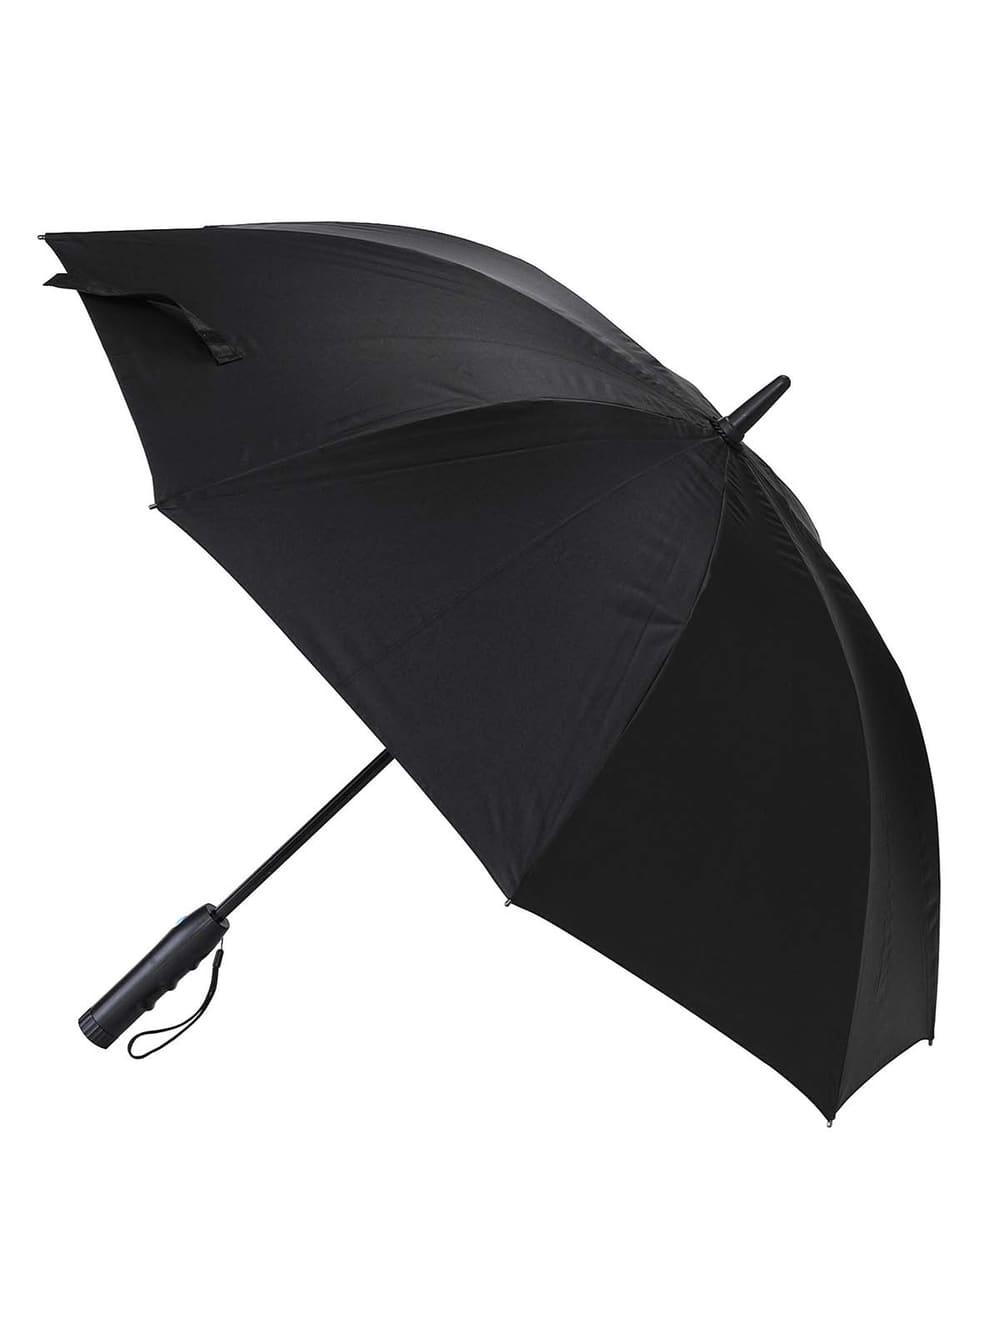 【ANGELIEBE/エンジェリーベ】 【SPICE】ファンファンパラソル 扇風機付き日傘 ブラック・60cm